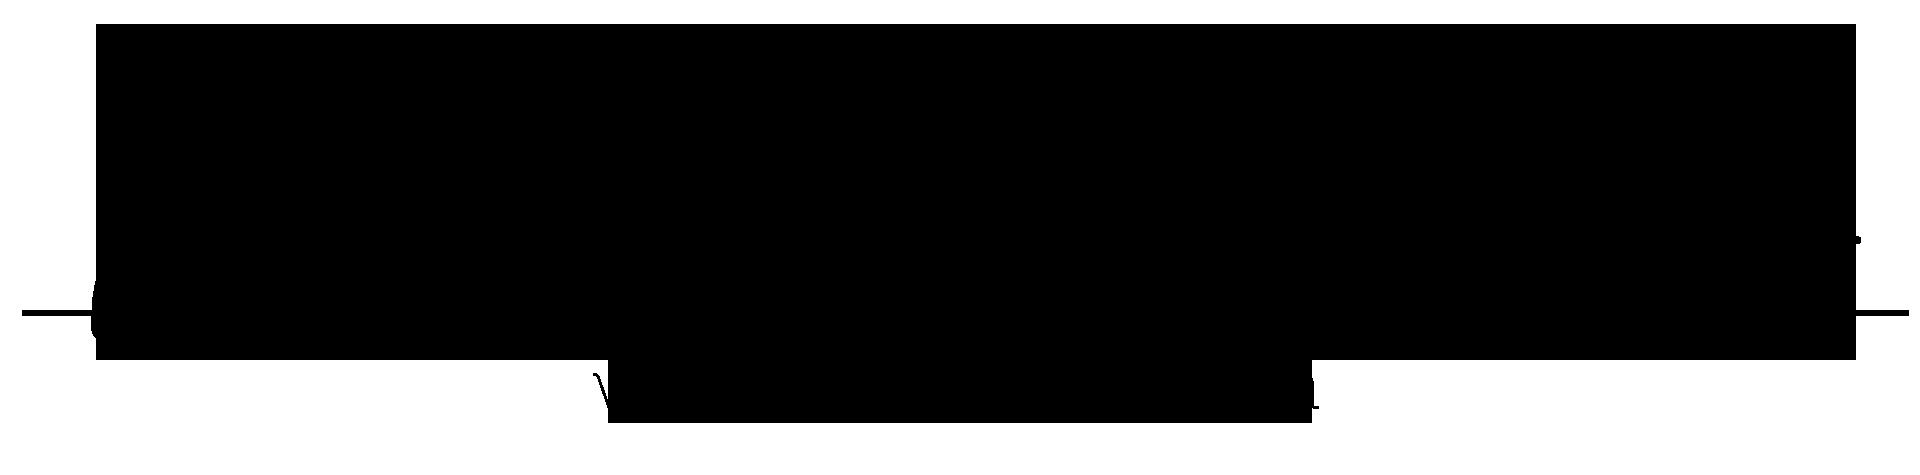 firma victor peseta negro